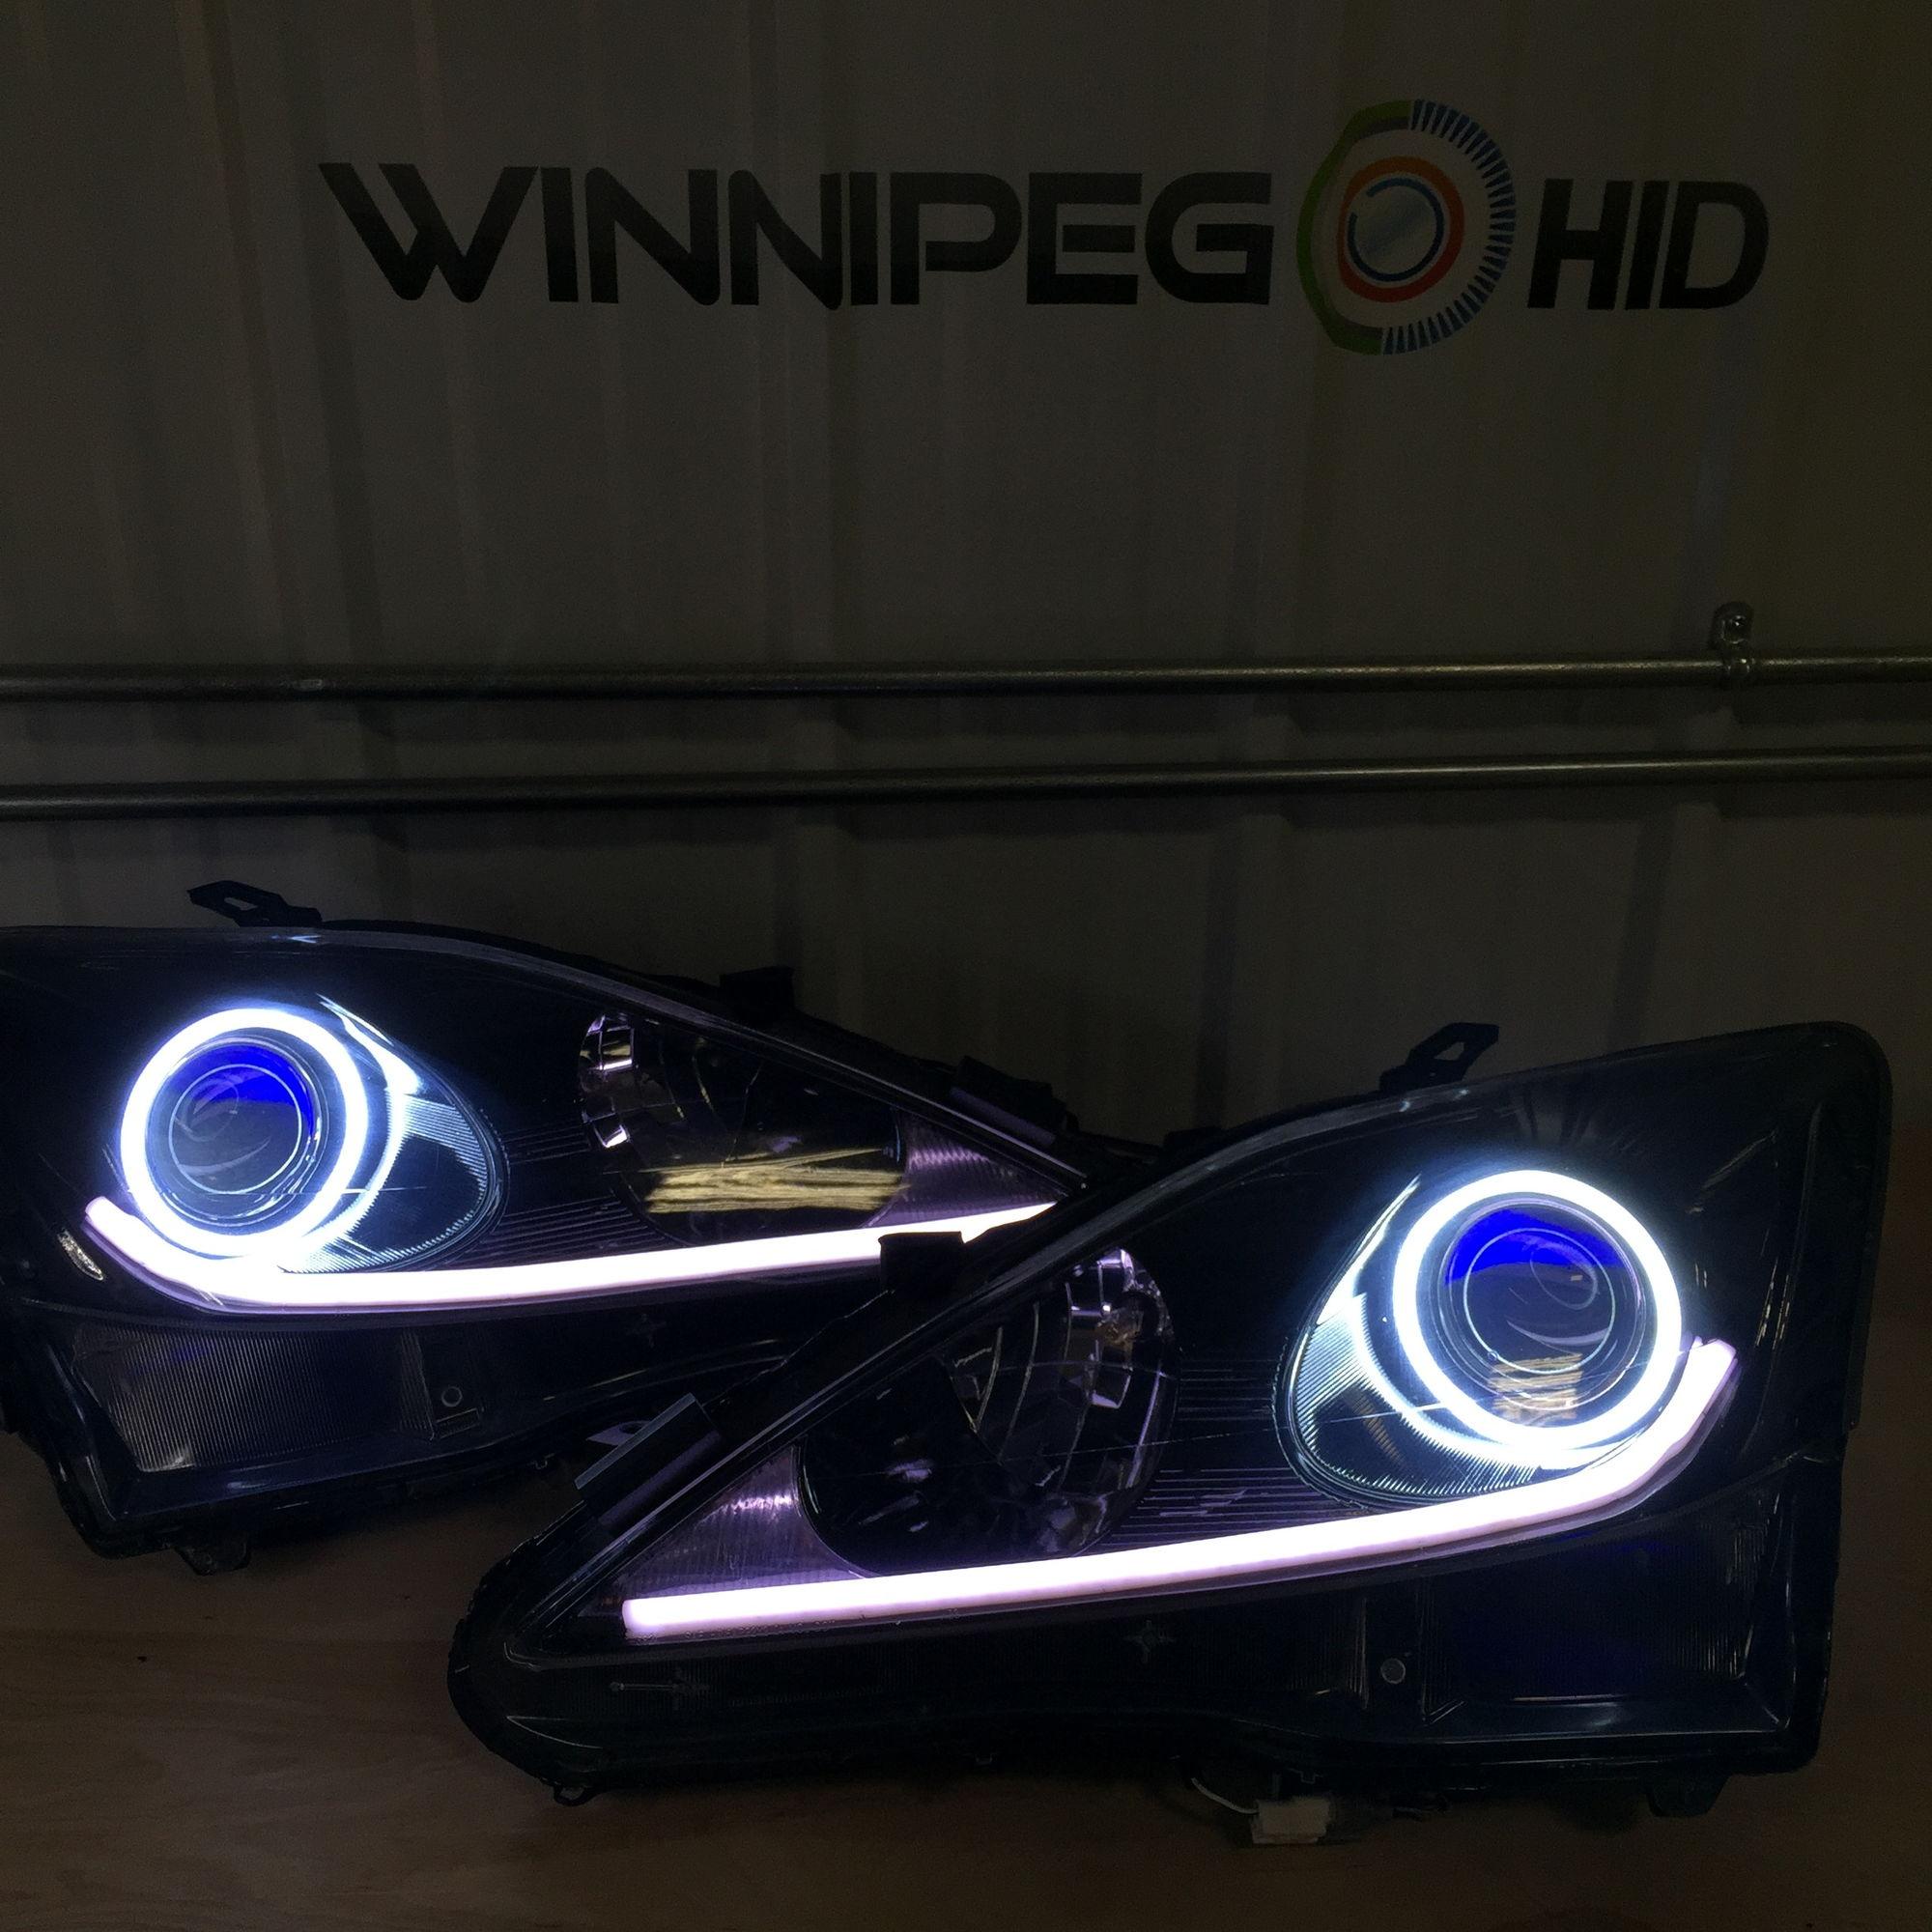 08 Isf Headlight Wiring Diagram - Clublexus